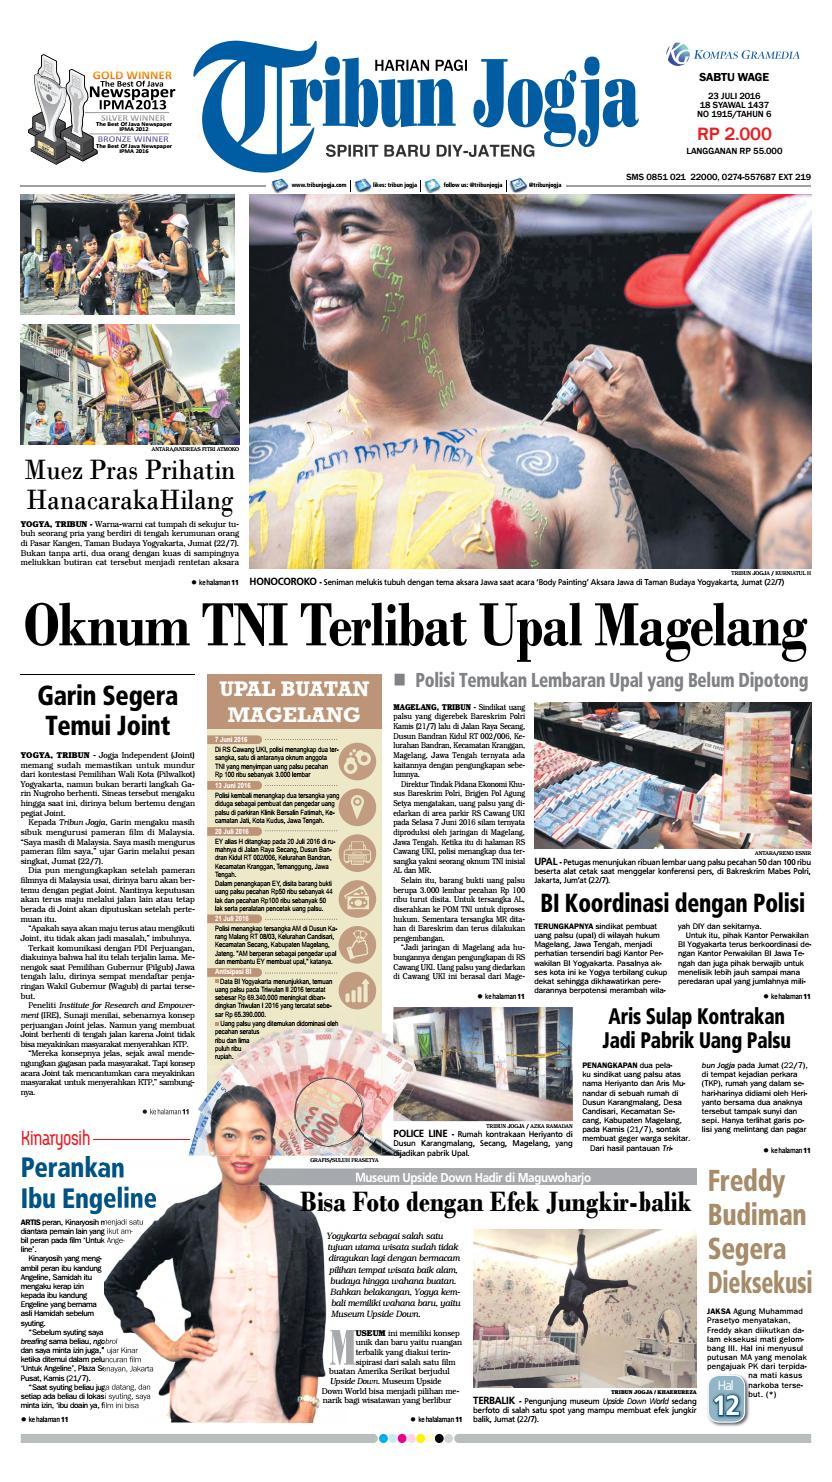 Tribunjogja 23 07 2016 By Tribun Jogja Issuu Produk Ukm Bumn Baju Muslim Anak Laki Dannis Nomor 10 Abu